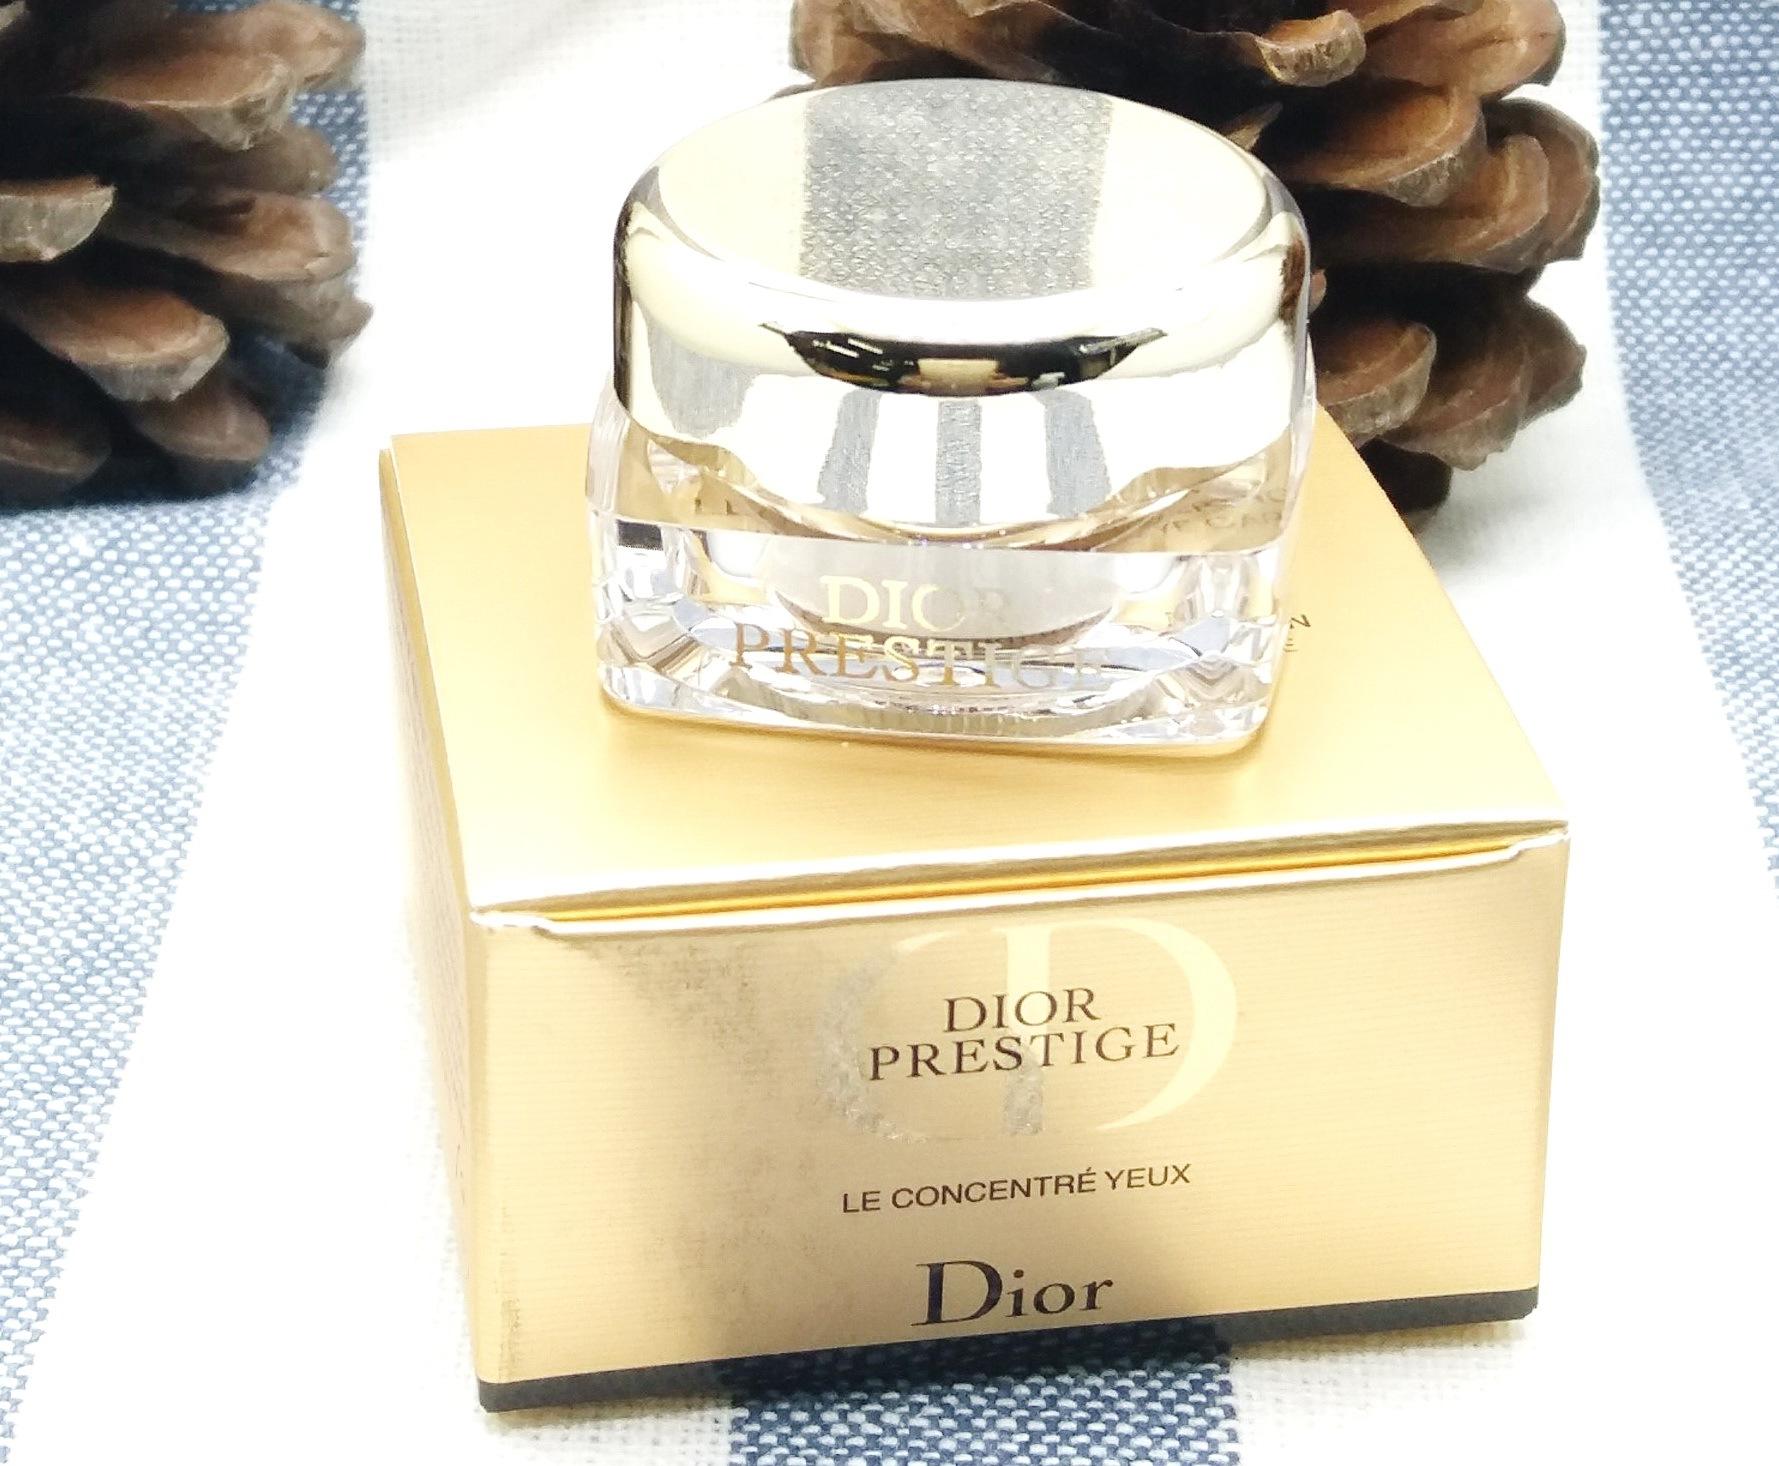 Dior Prestige Rose Satin Revitalizing Eye Creme 3ml. ครีมเนื้อเนียนลื่นดุจแพรไหม กระตุ้นพลัง ฟื้นฟูความเรียบเนียนและกระจ่างใส คืนความอ่อนเยาว์ให้ผิวรอบดวงตาและเปล่งประกาย กระจ่างใสขึ้น บำรุงผิวรอบดวงตาสูตรอ่อนโยนให้เนื้อครีมบางเบา ช่วยลดเลือนรอยหมองคล้ำ อ